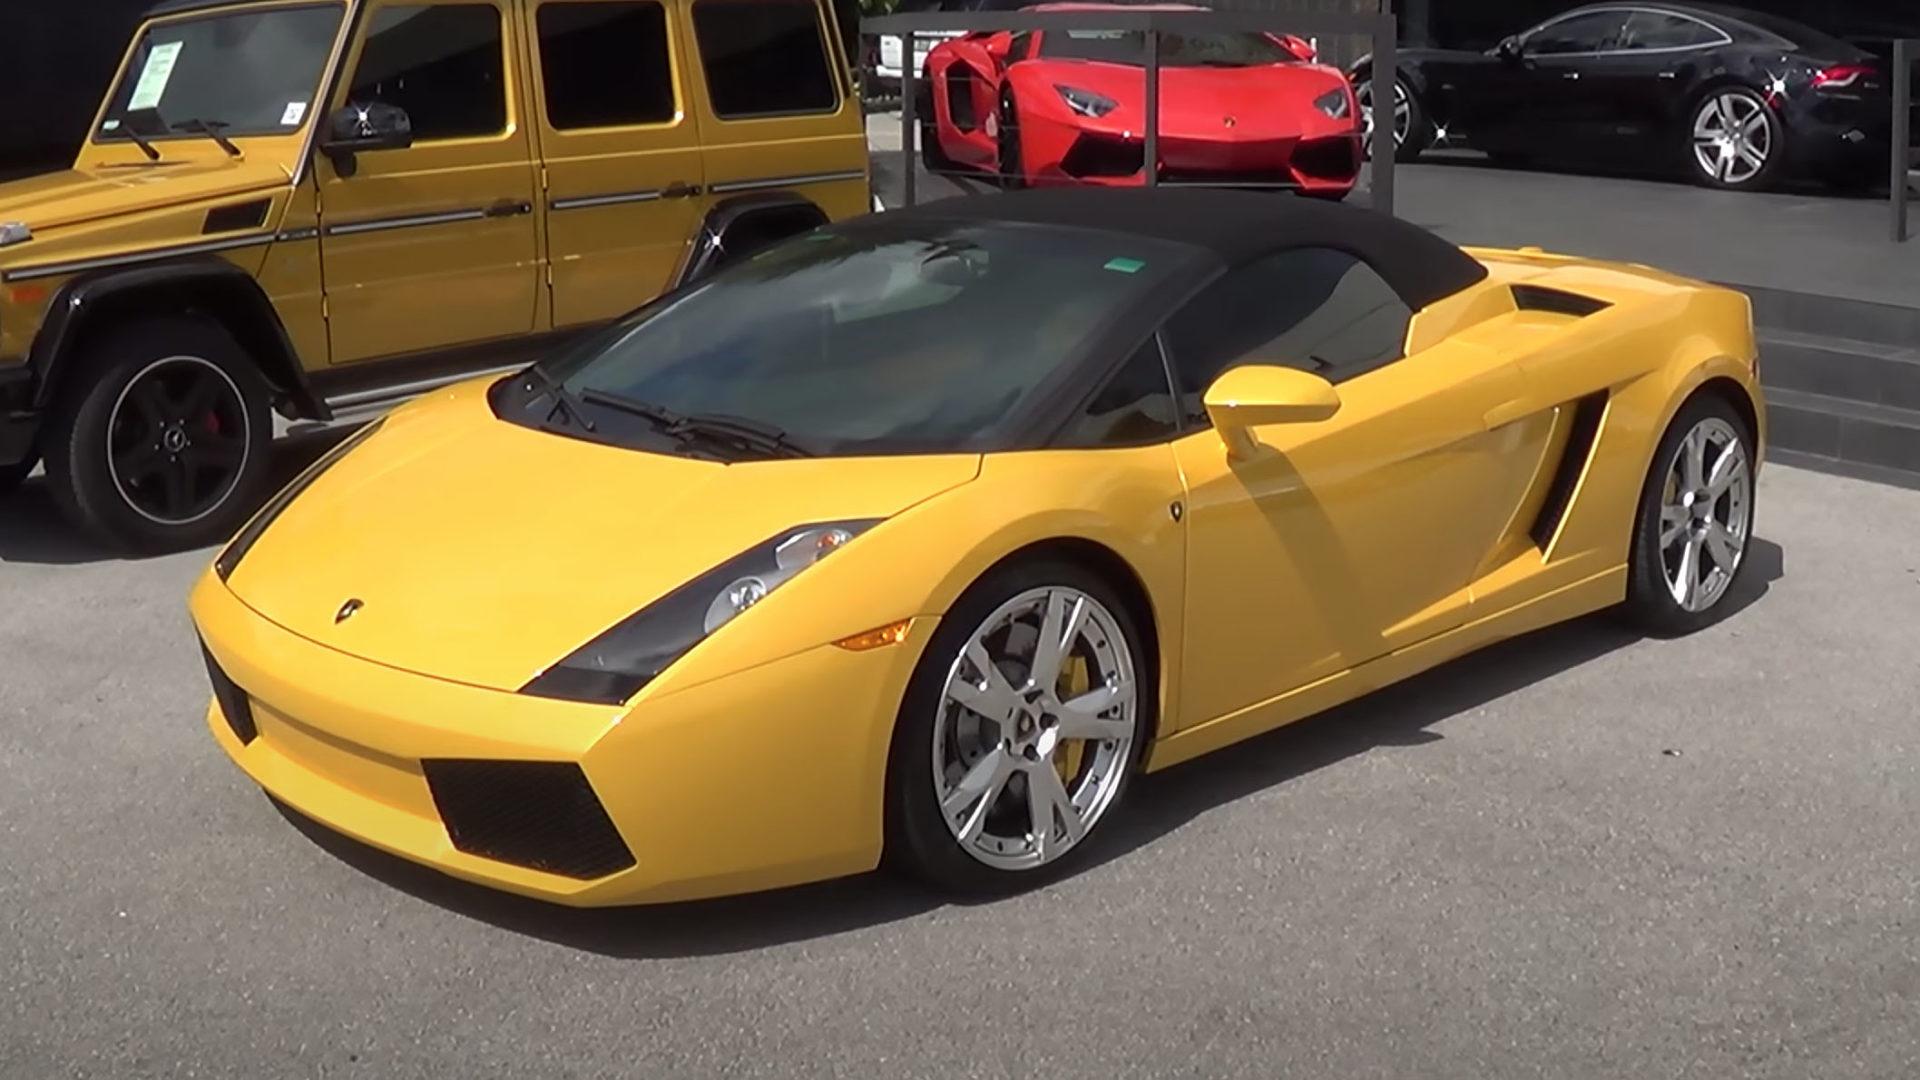 Lamborghini Gallardo yellow